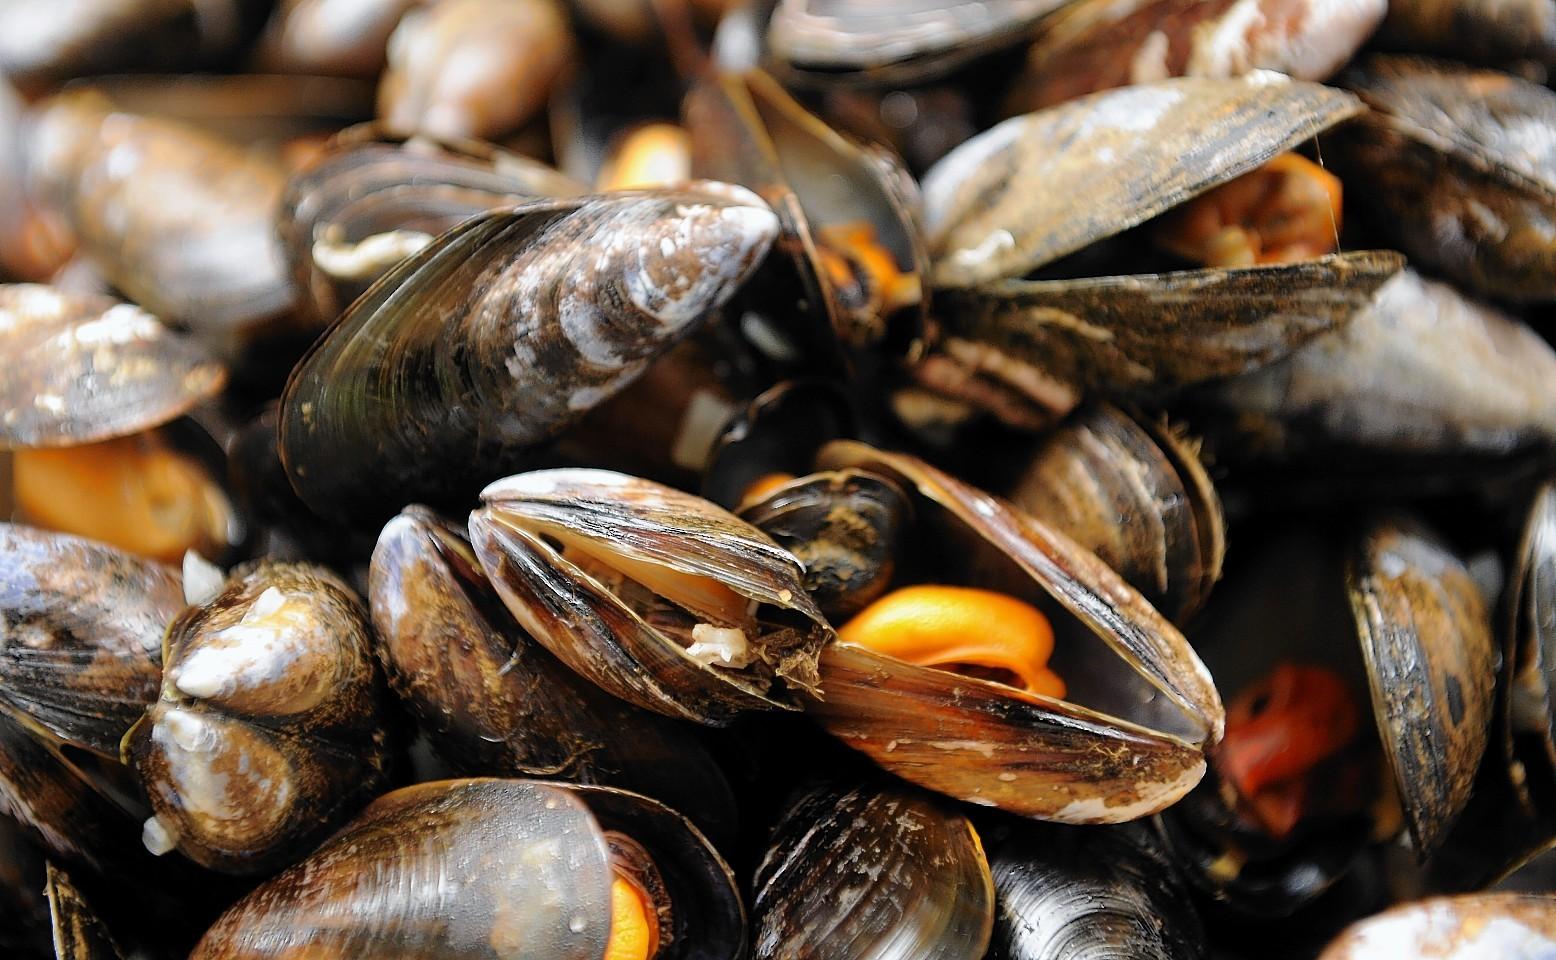 Scottish mussels